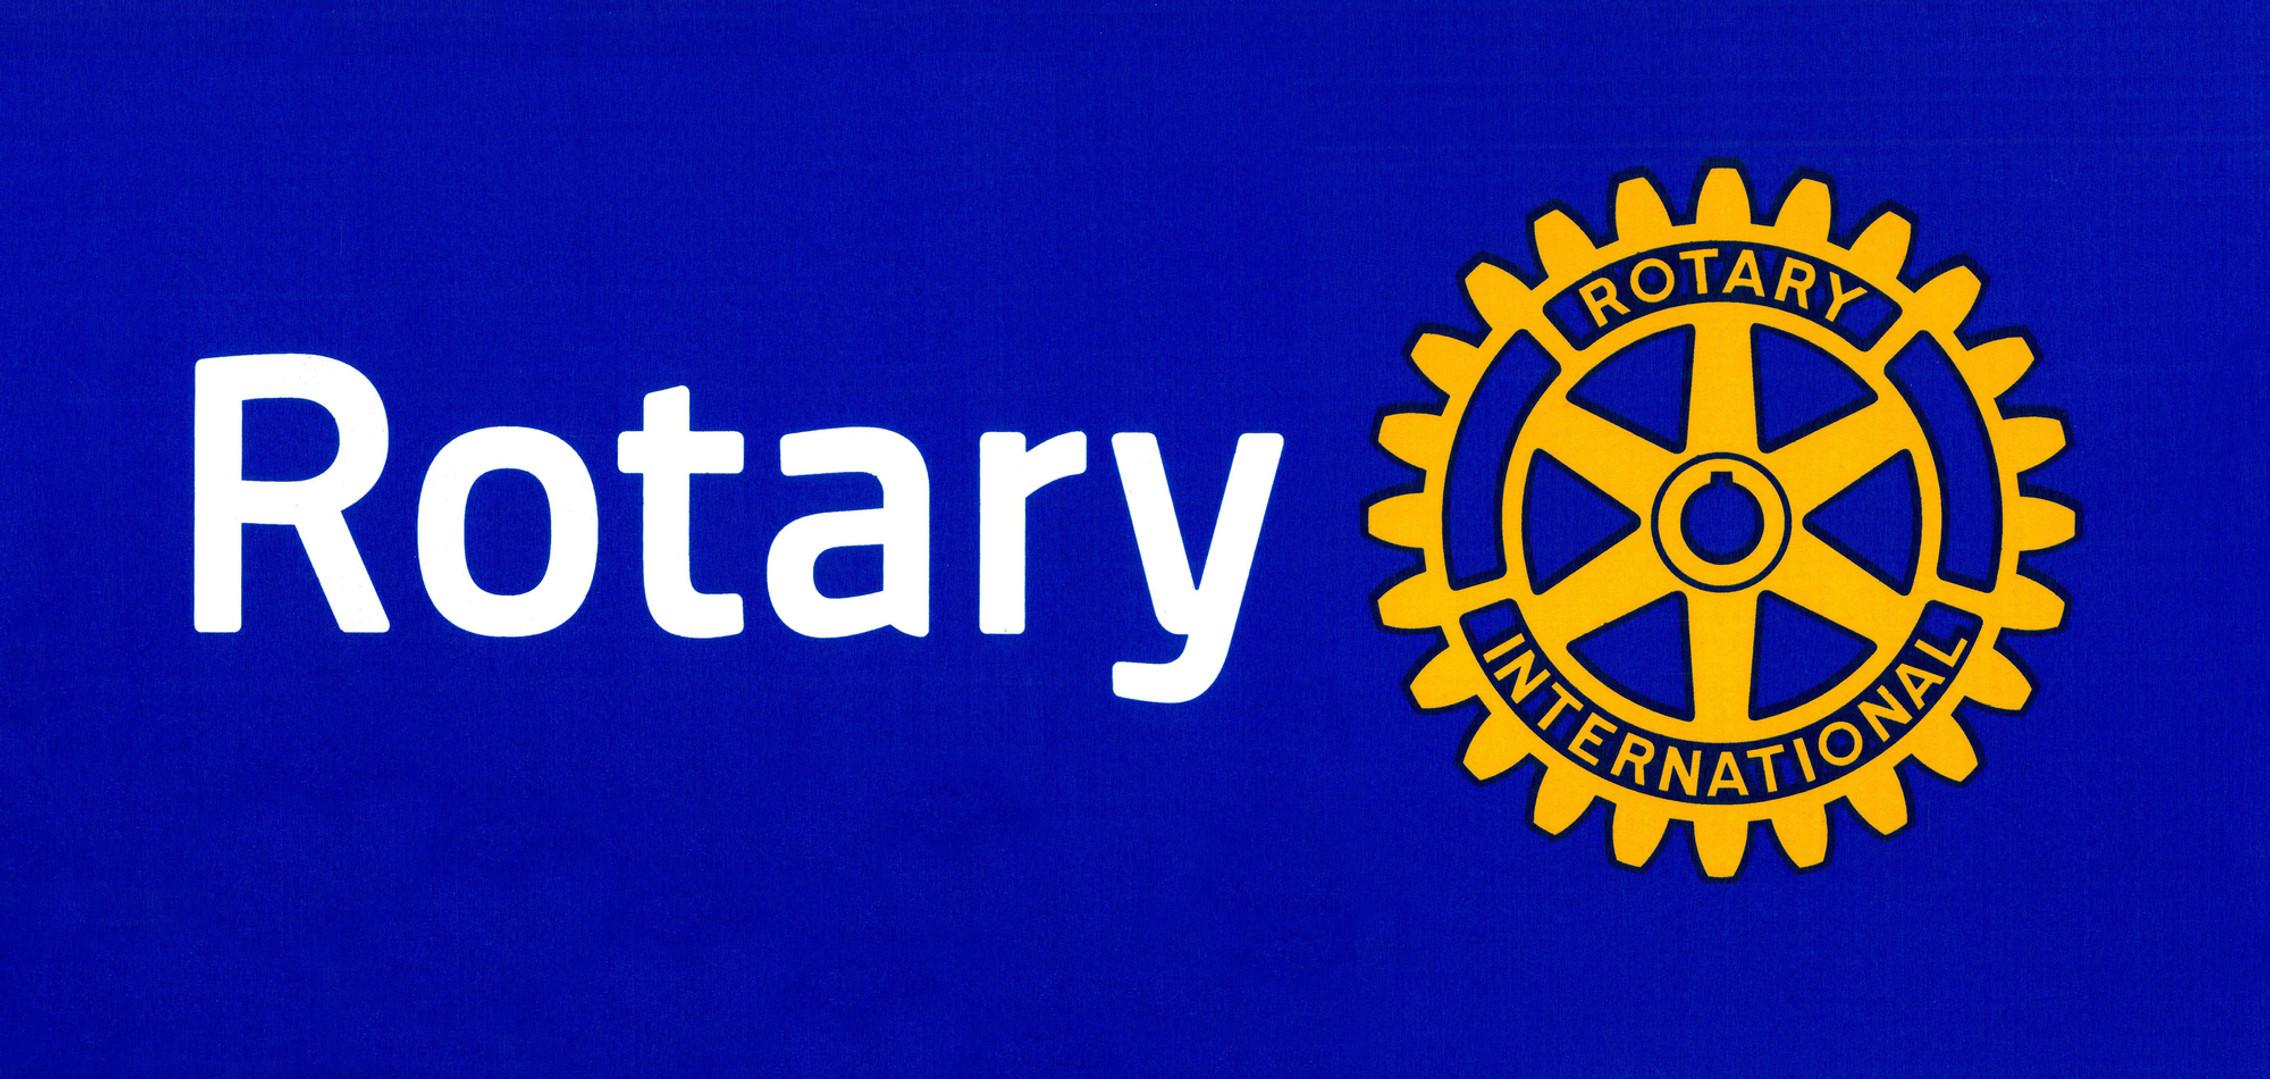 00-Rotary-Theme.jpg